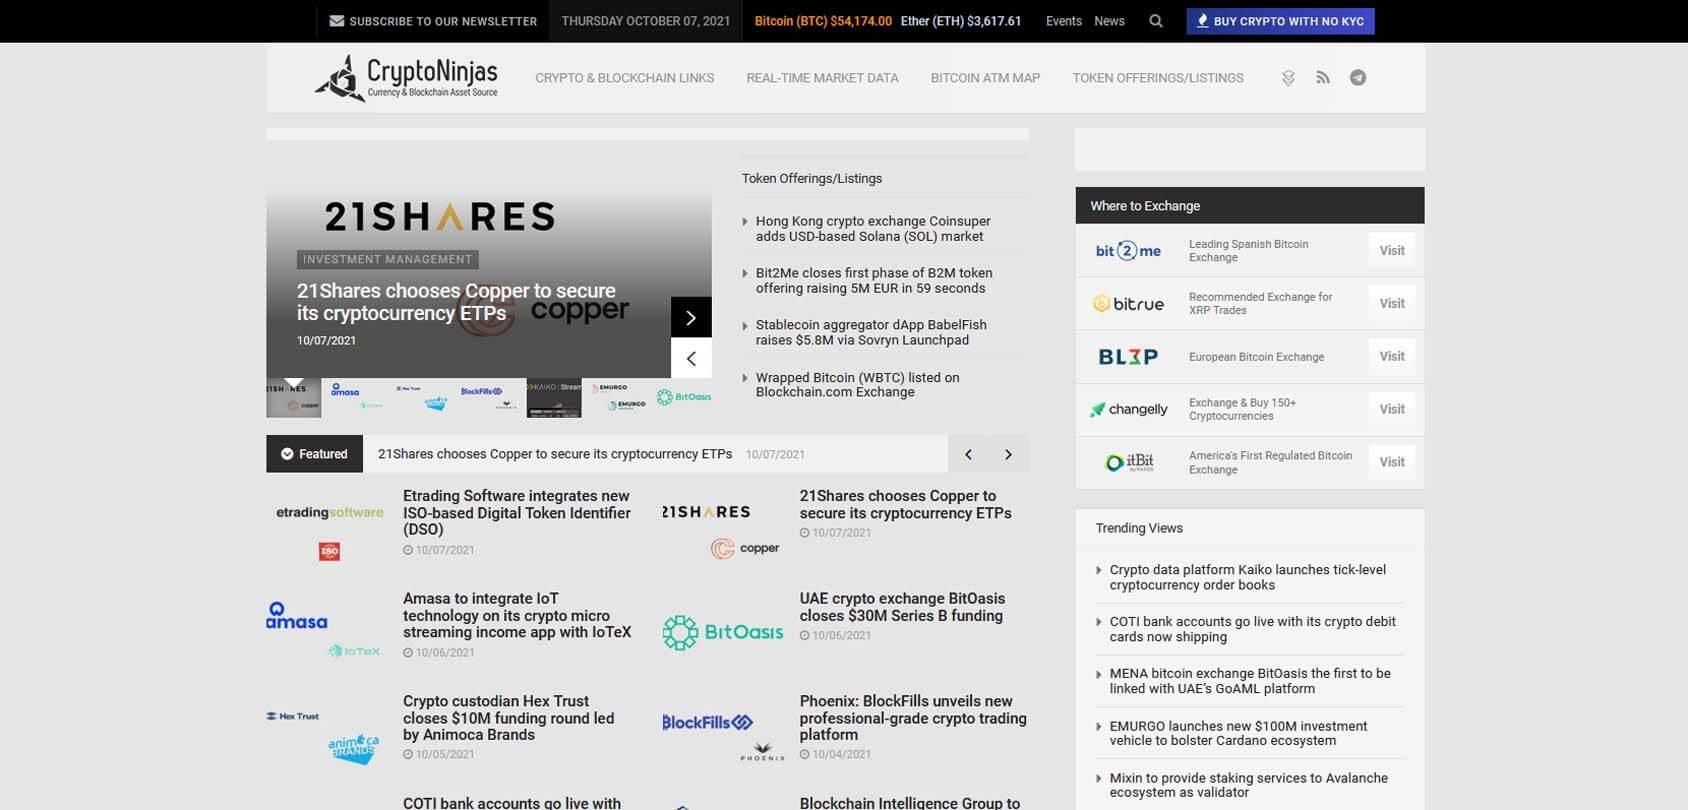 CryptoNinjas Homepage